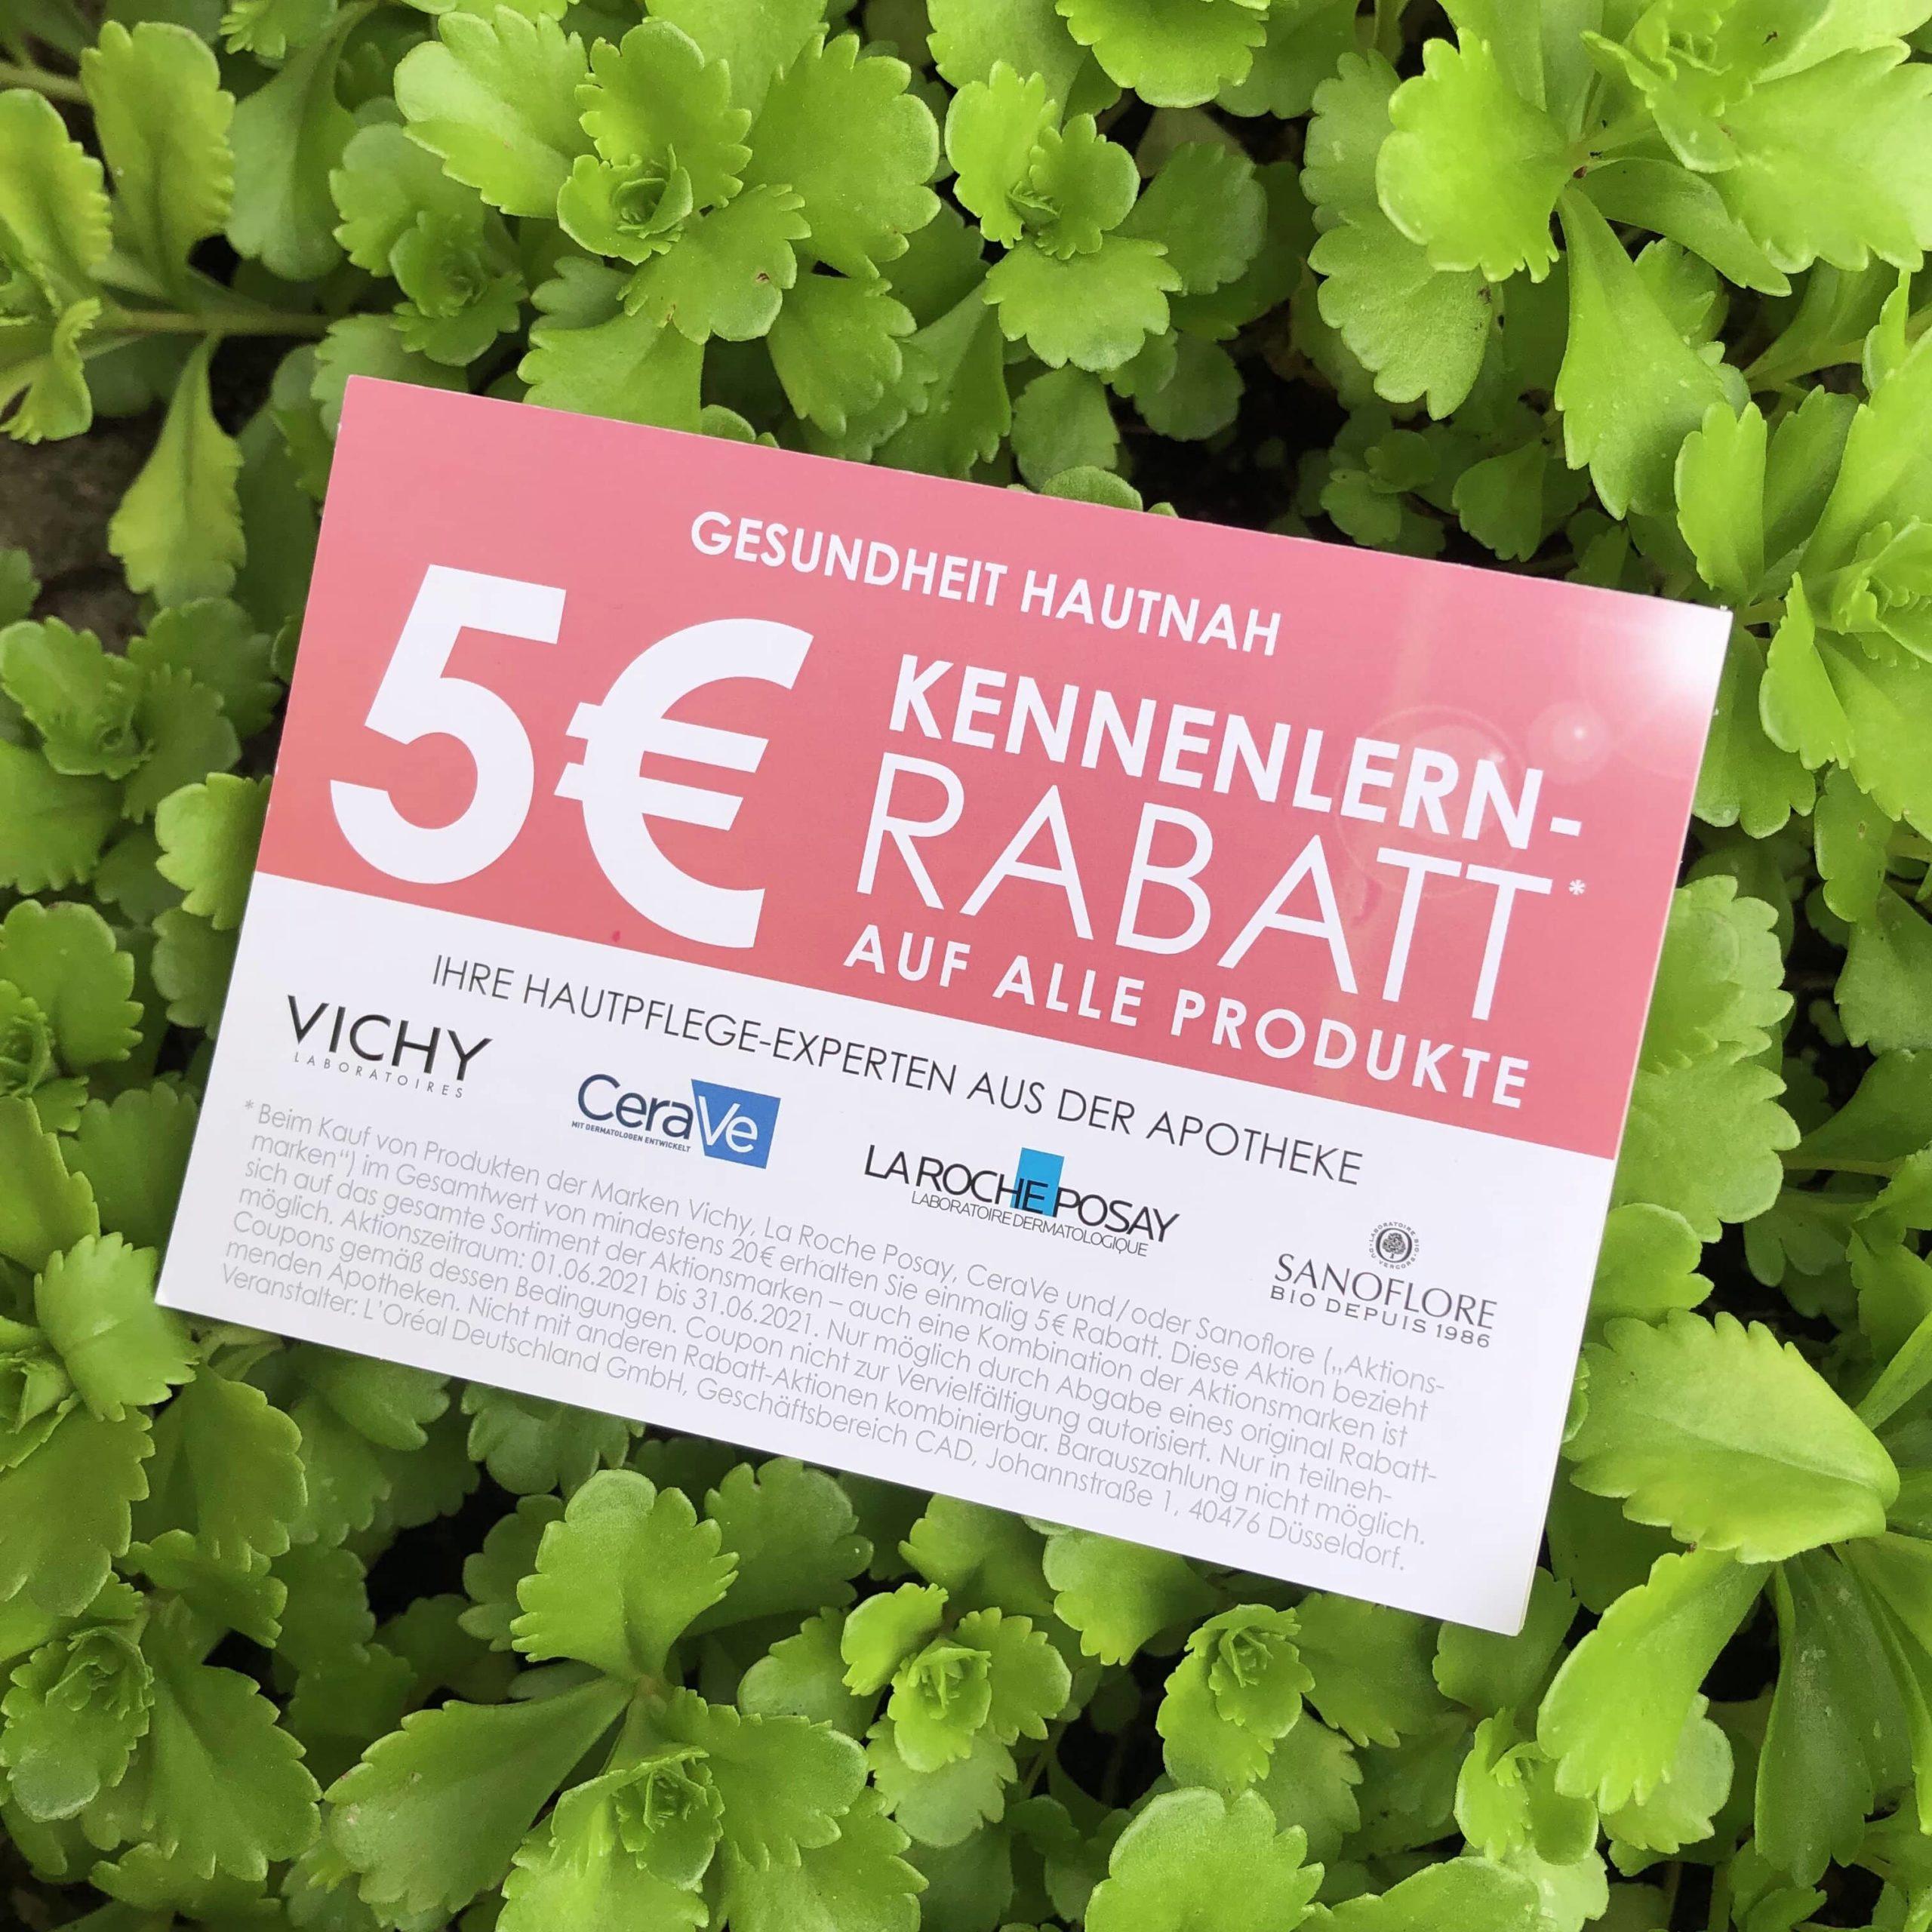 Kennenlern-Rabatt - Königs-Apotheke Münster